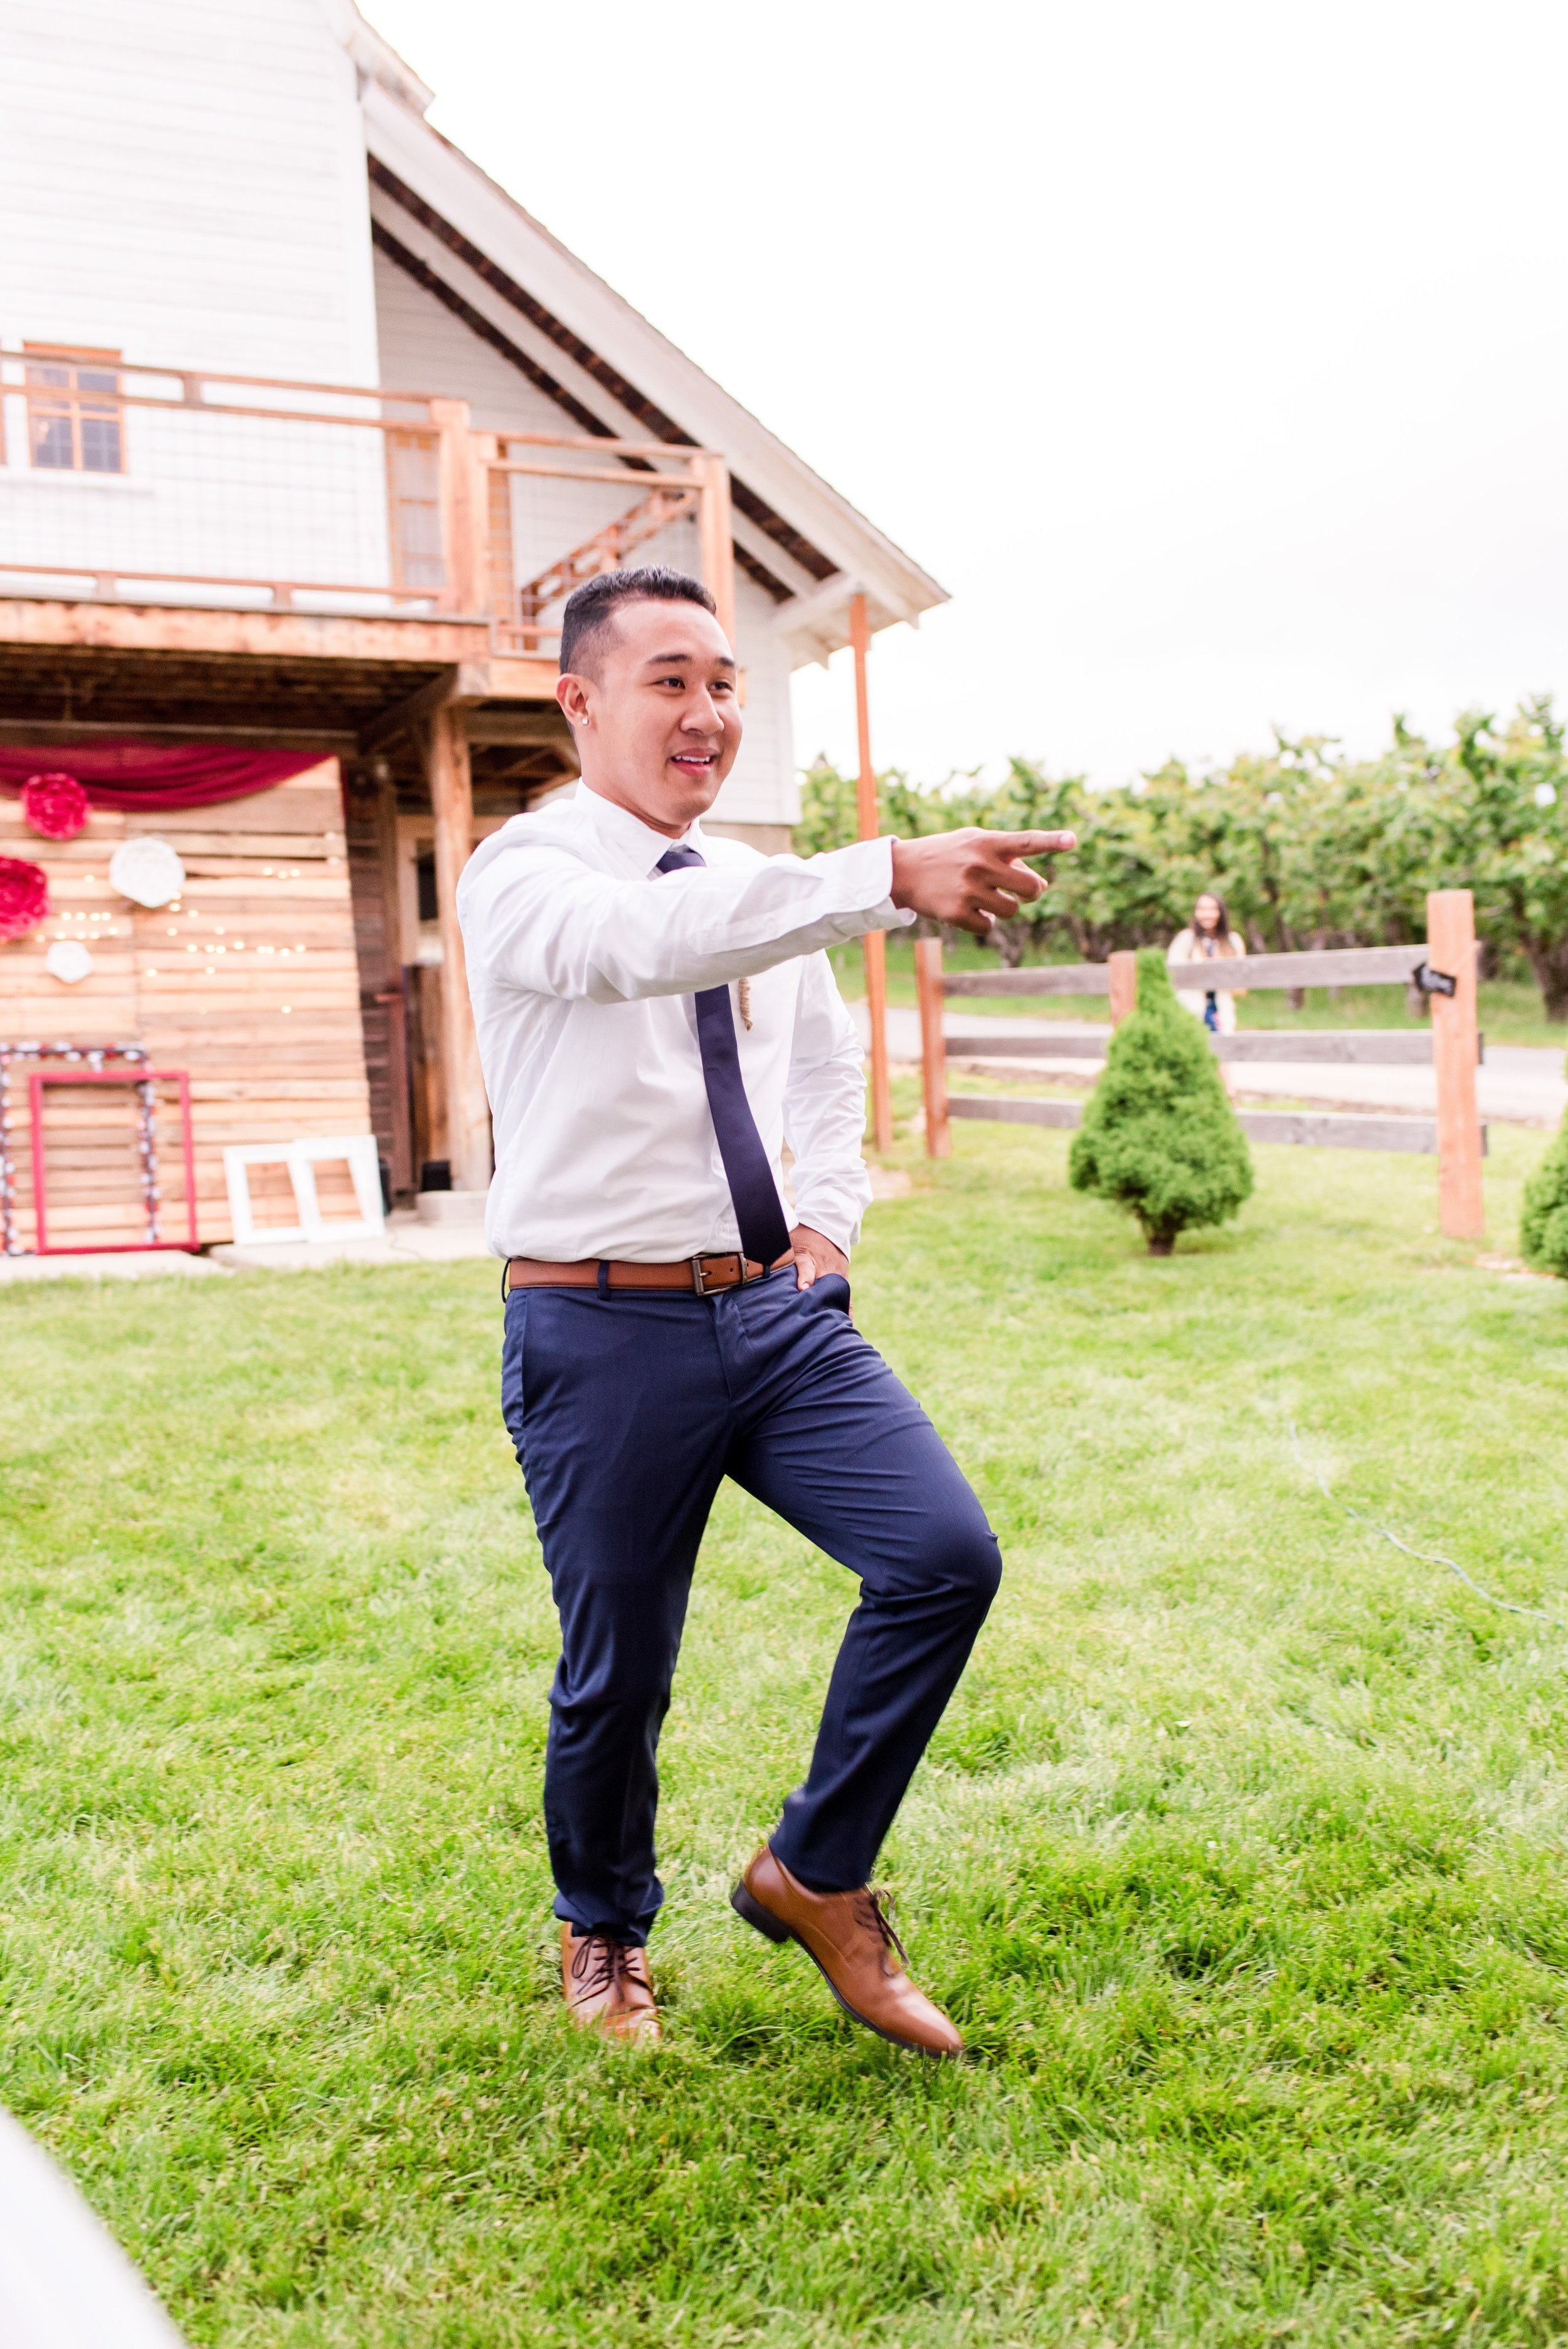 Wenatchee, Washington White Barn Wedding - Hampton Hideaway - Morgan Tayler Photo & Design - Wenatchee Wedding Photographer